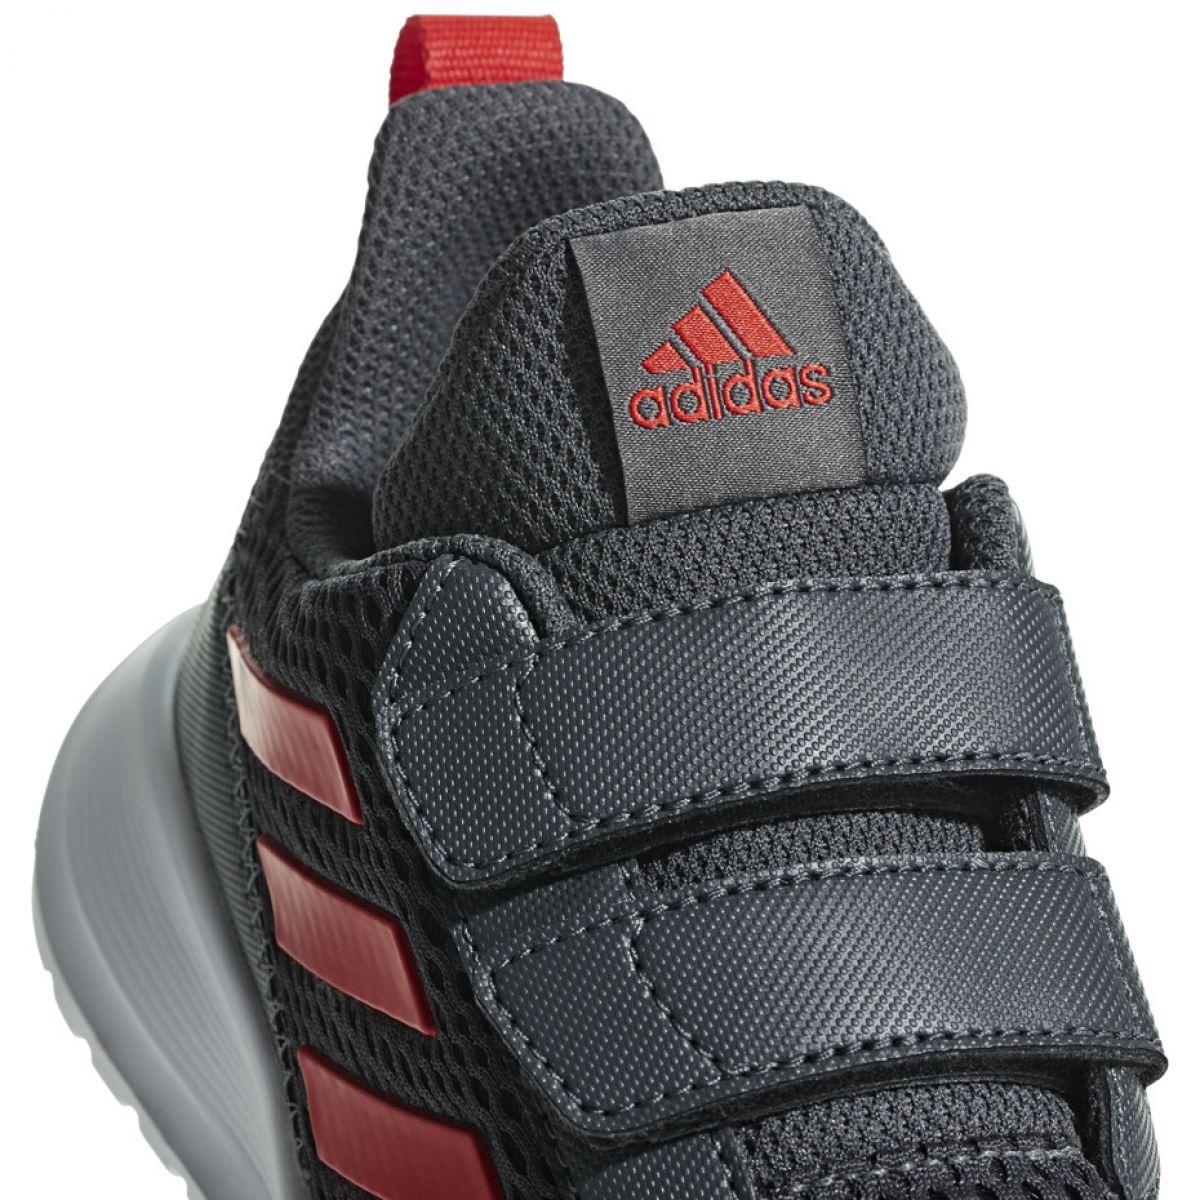 Calçado Adidas AltaRun Cf Jr CG6896 preto